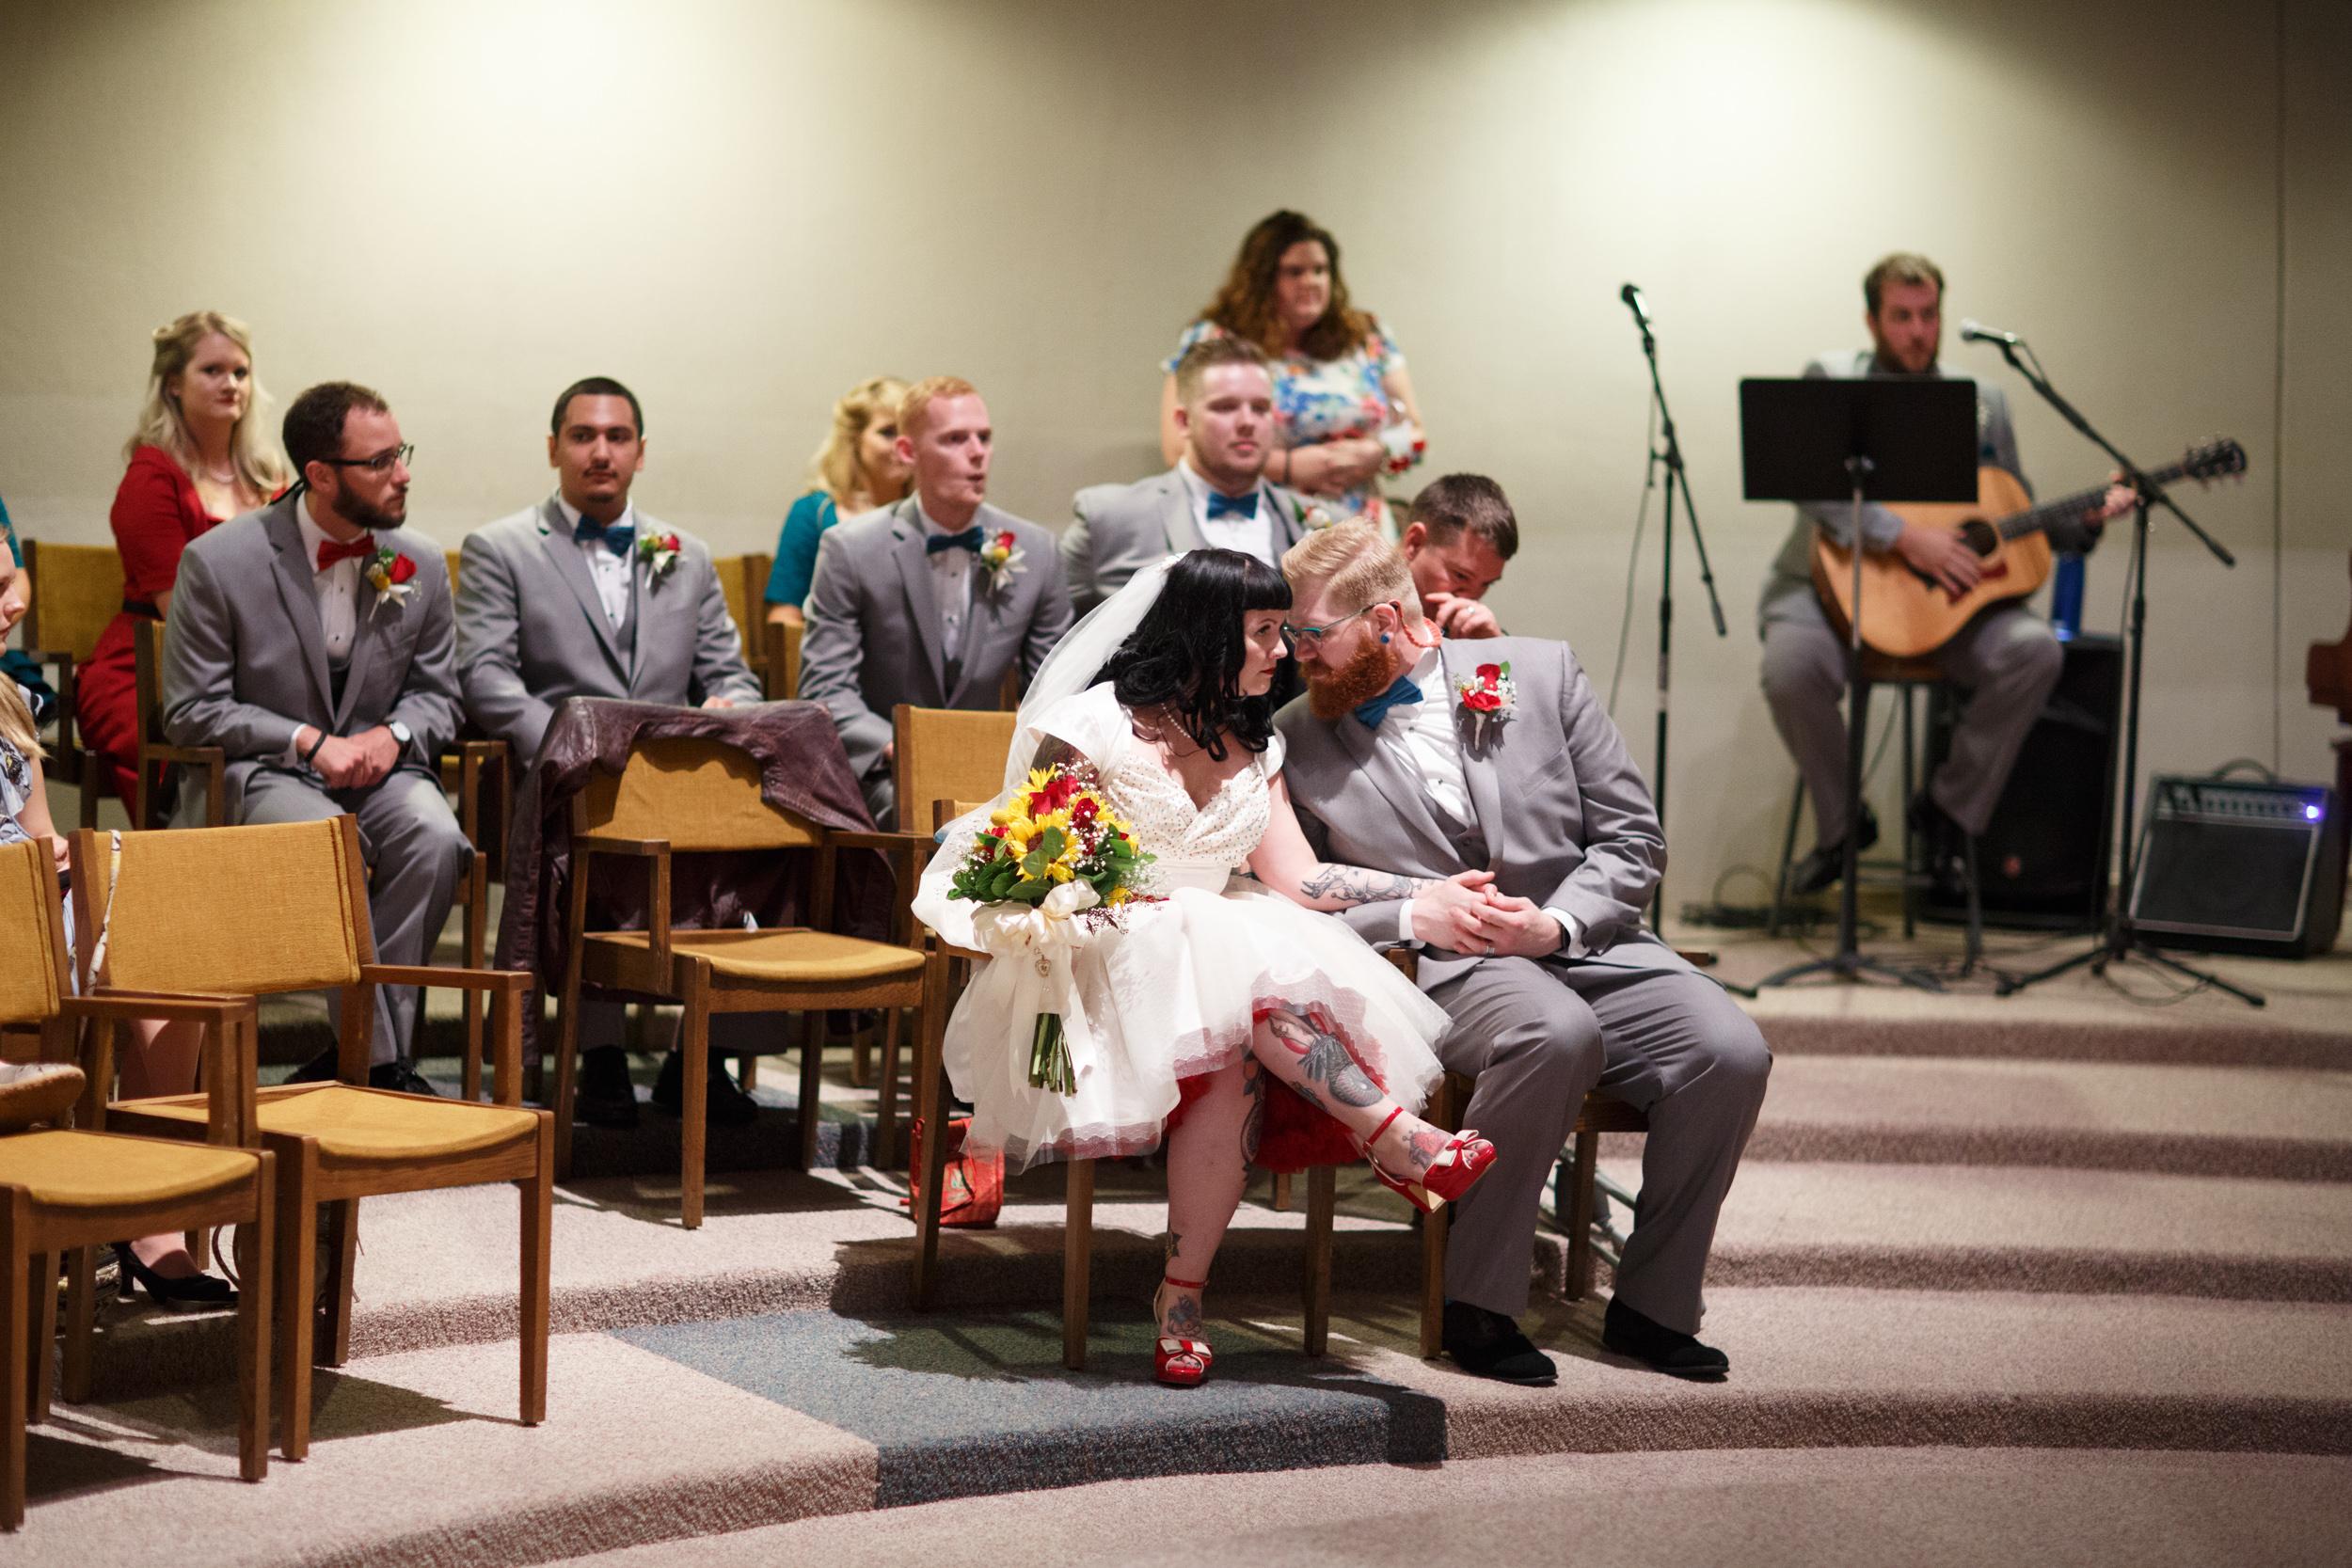 Christian & Sarah wedding photography by Brian milo-170.jpg